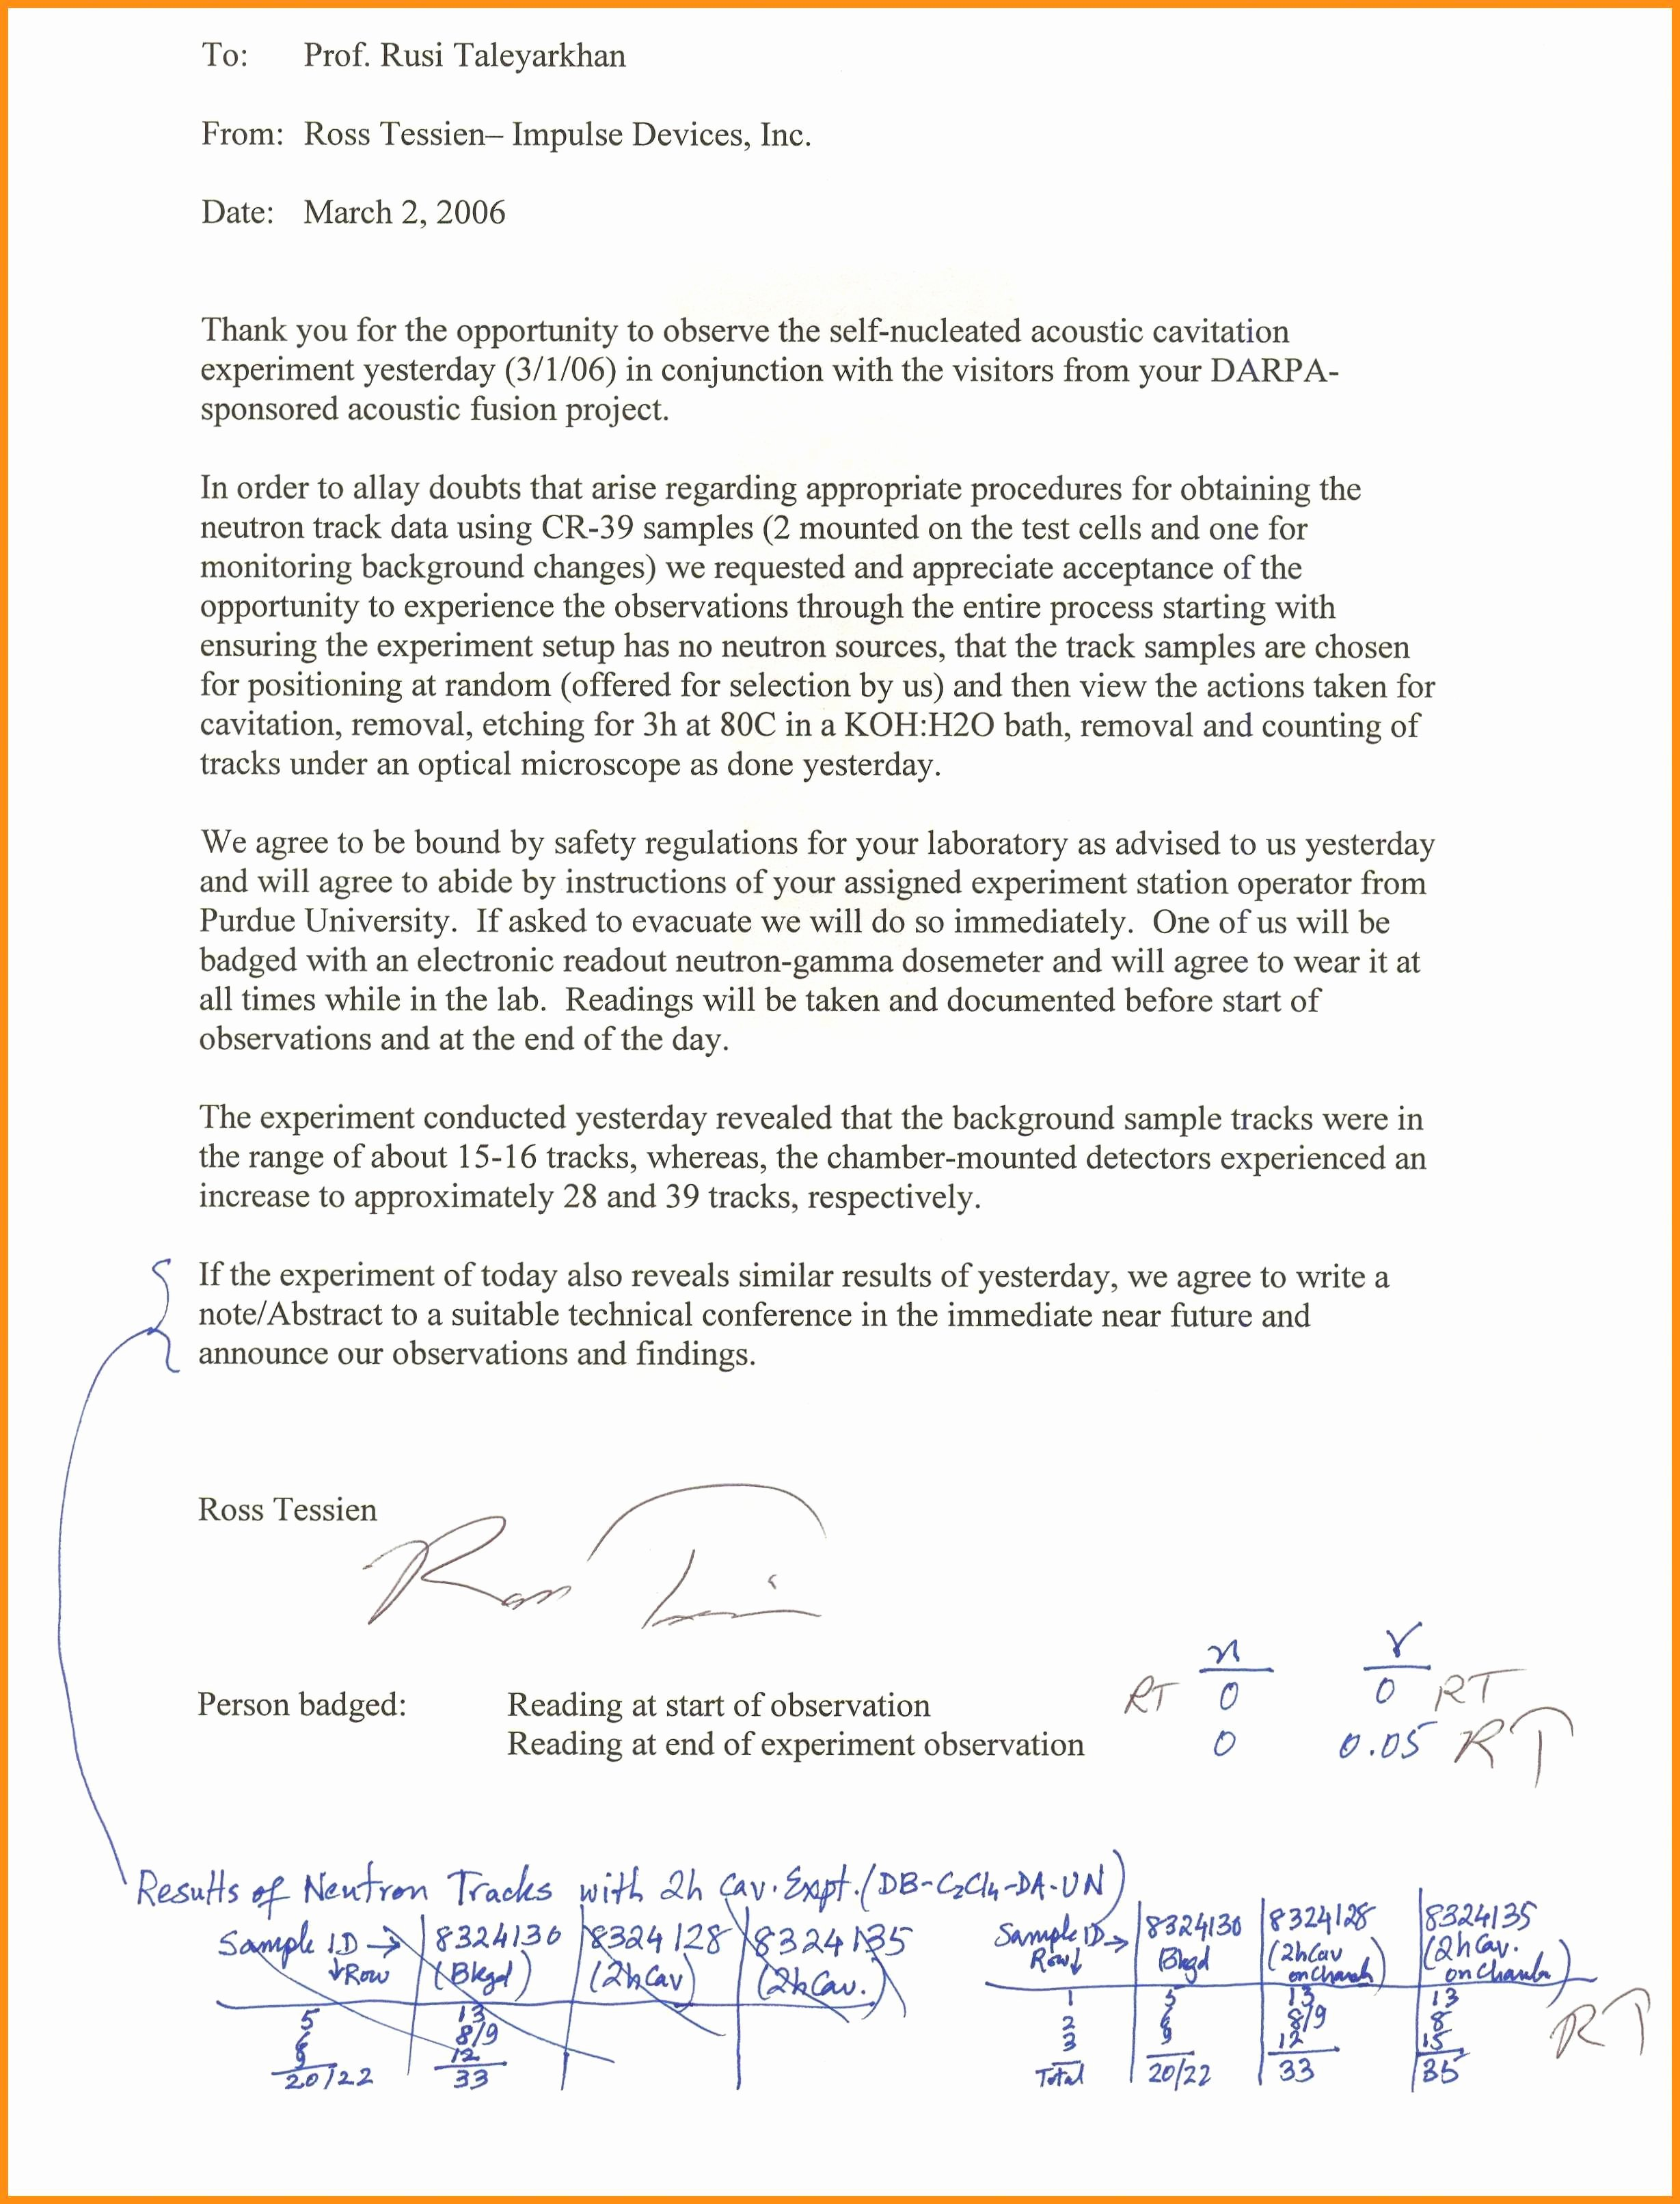 Letter Of Affidavit Of Support Lovely 11 12 Affidavit Of Support Example Letters